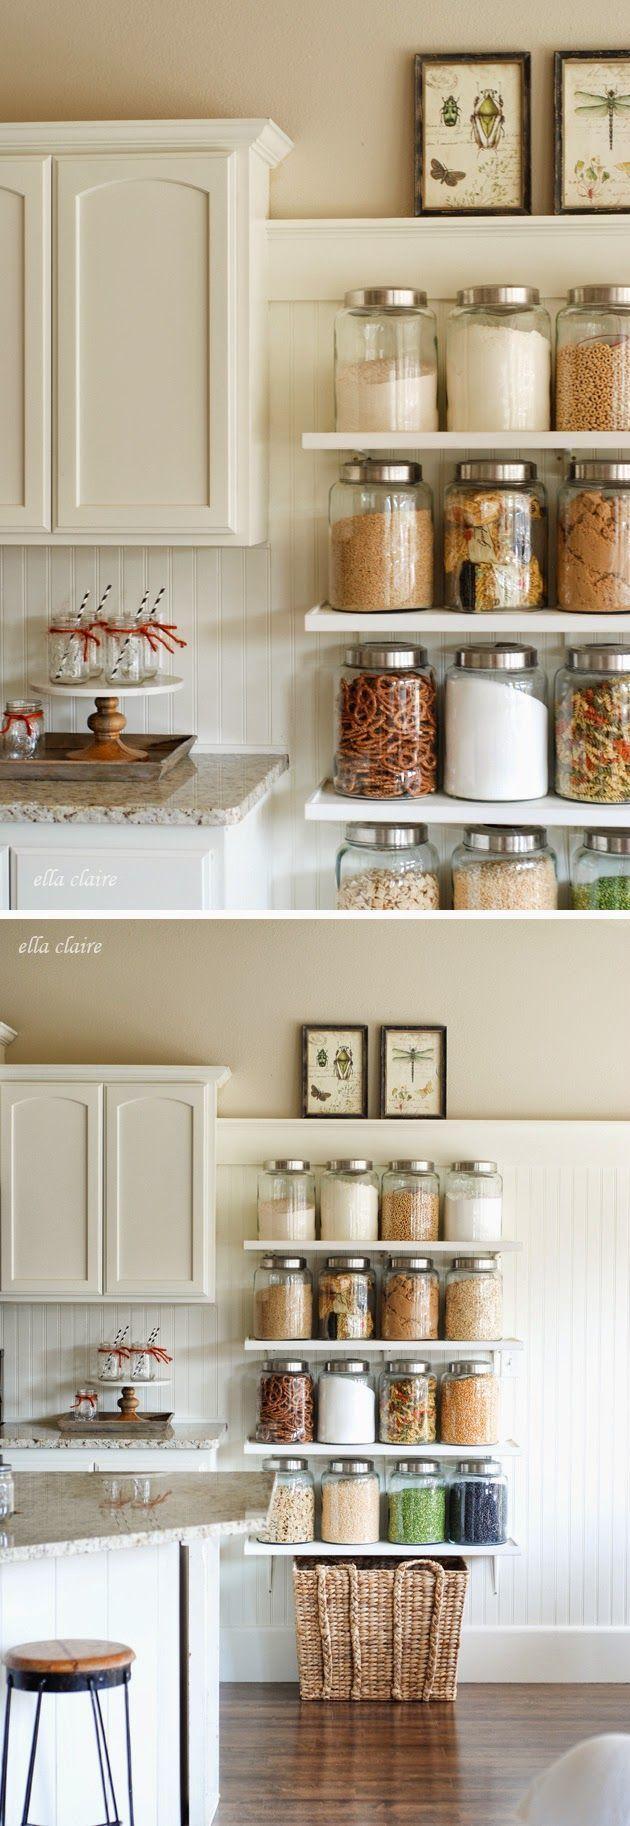 61 best Studio Kitchen images on Pinterest | My house, Home ideas ...